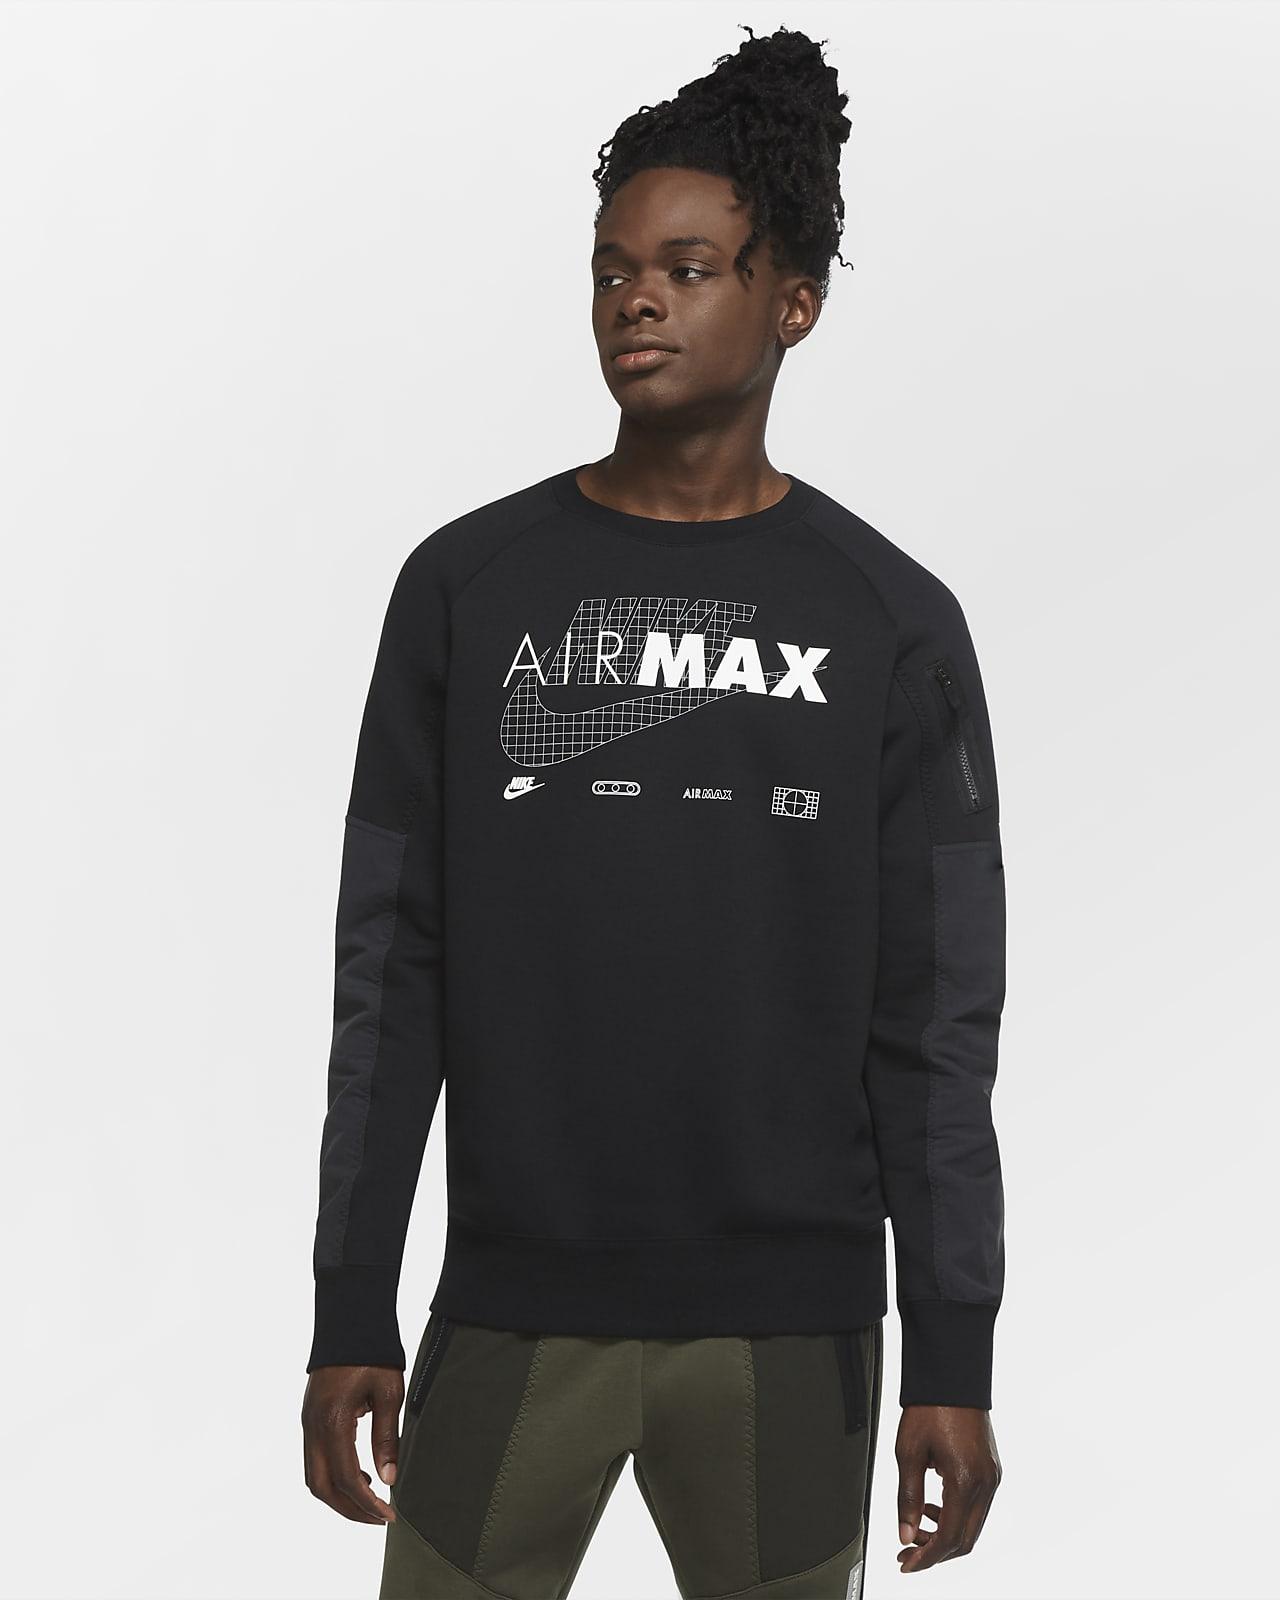 Haut en tissu Fleece Nike Sportswear Air Max pour Homme